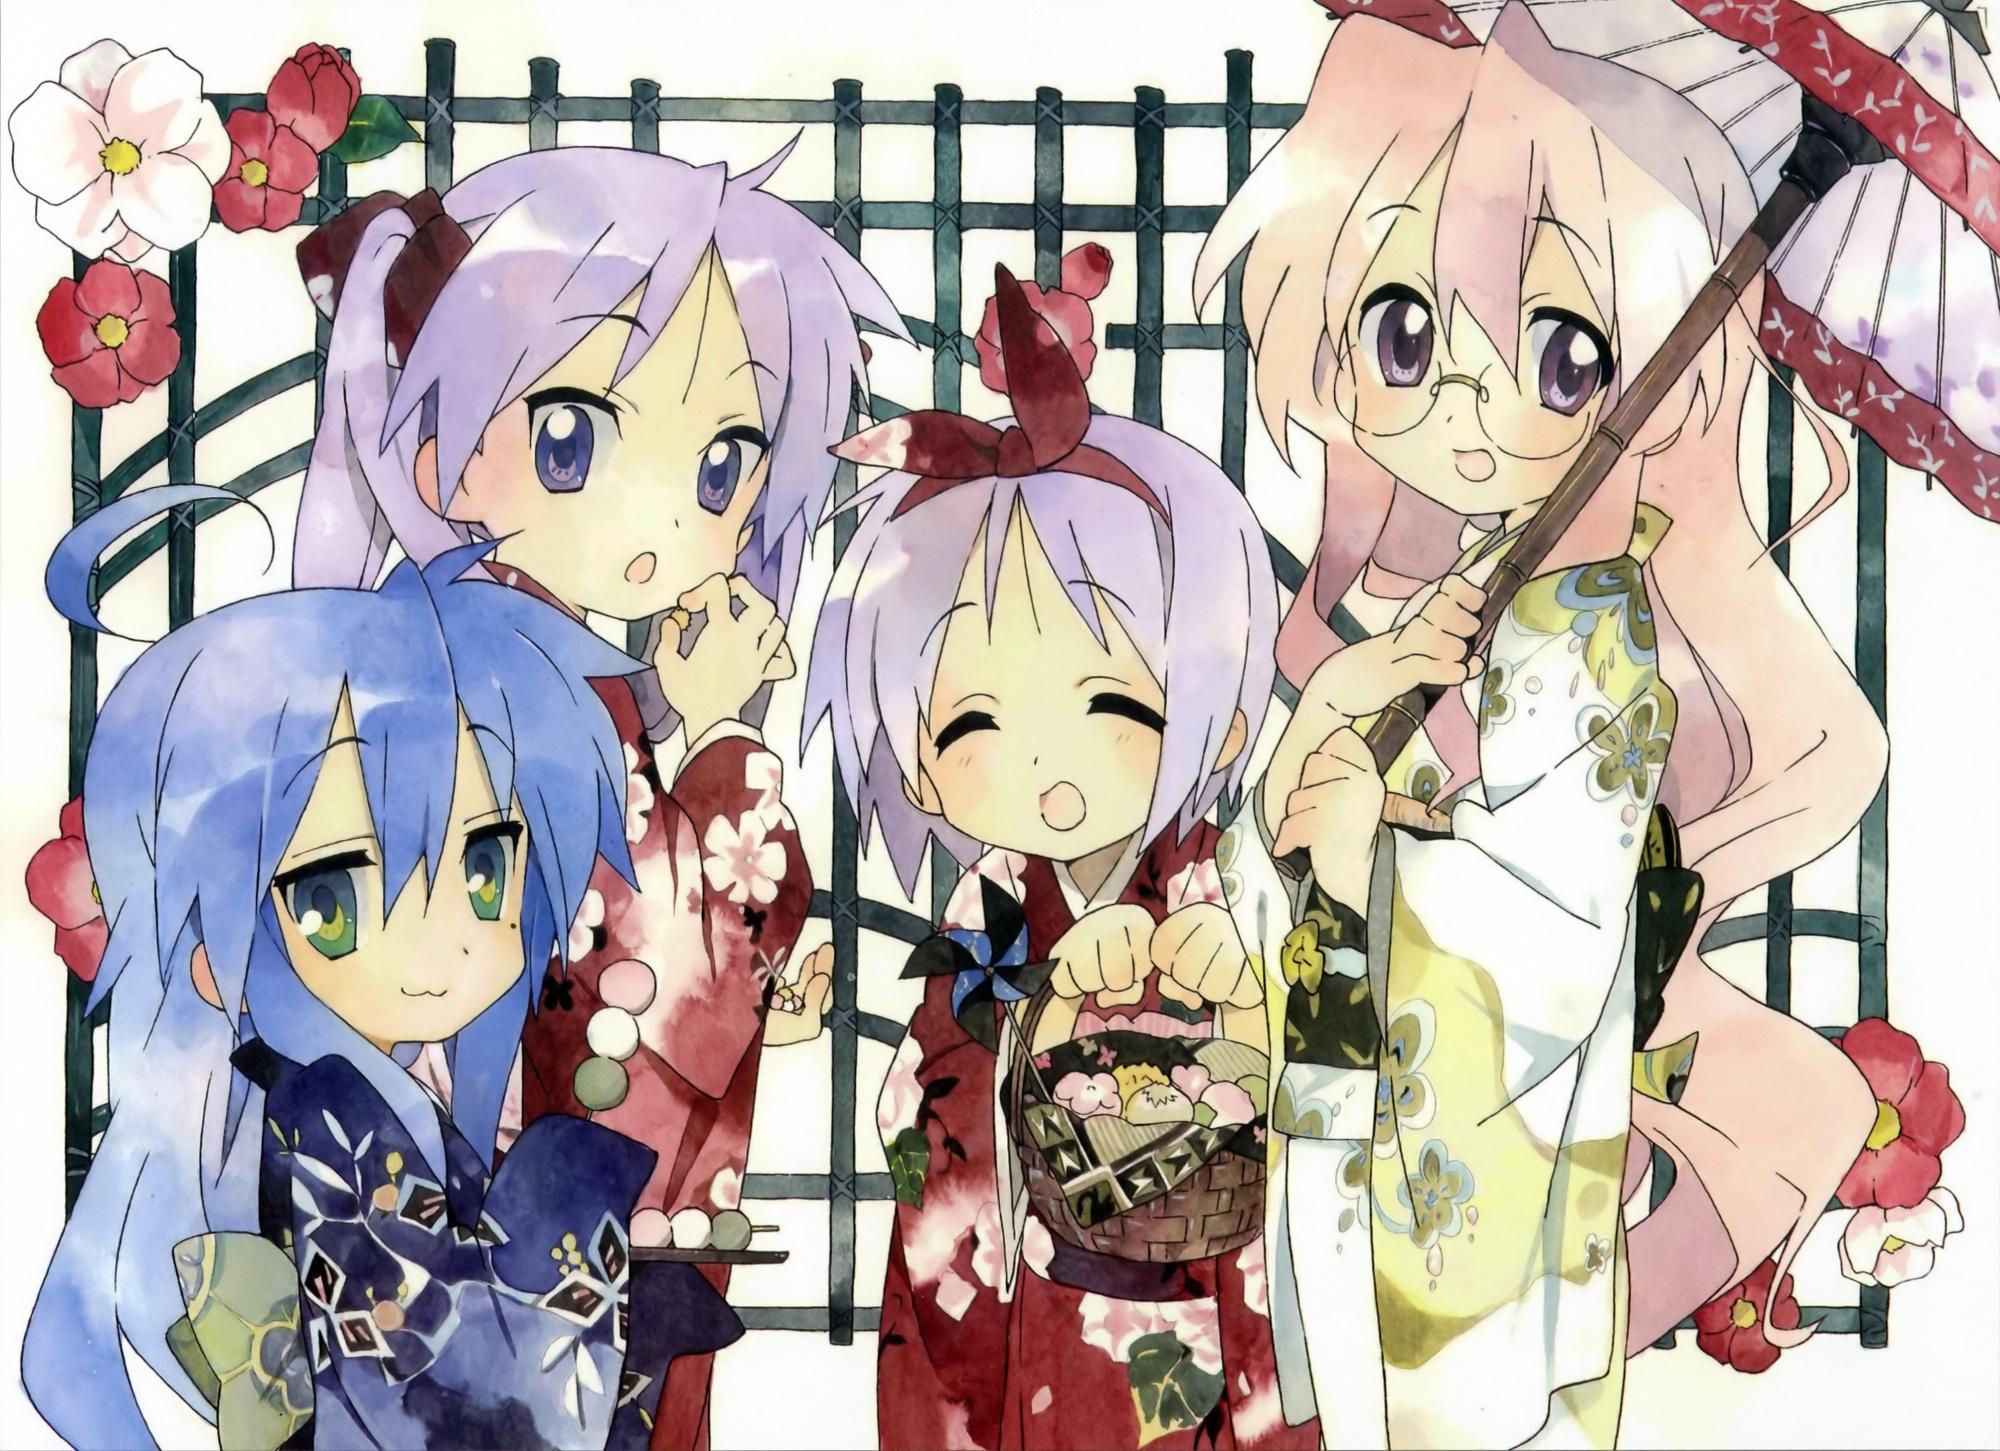 hiiragi_kagami hiiragi_tsukasa izumi_konata japanese_clothes kimono lucky_star scan takara_miyuki